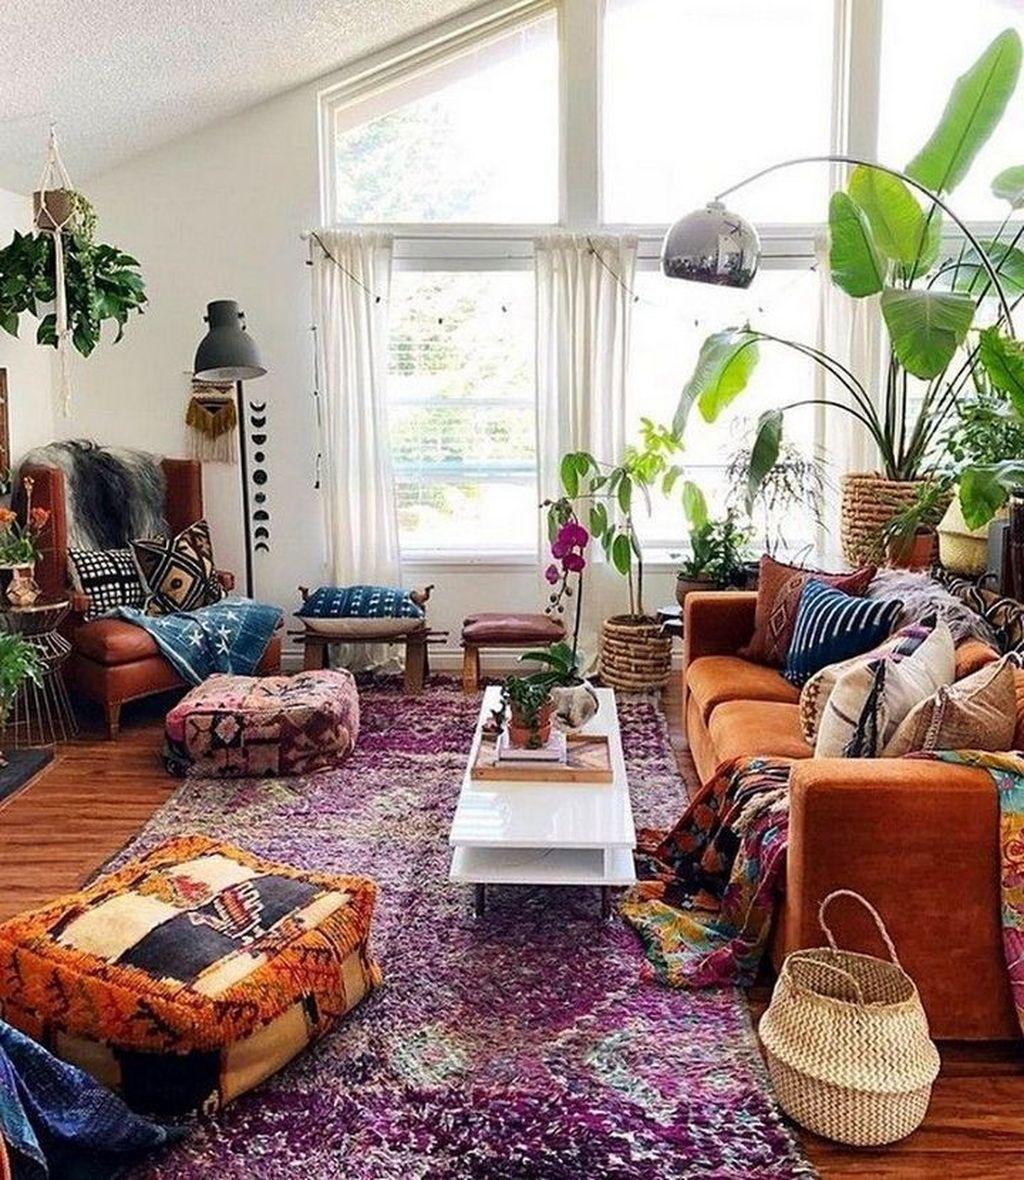 35 Lovely Bohemian Living Room Decor Ideas Bohemian Living Room Decor Vintage Living Room Decor Vintage Living Room Living room boho decor